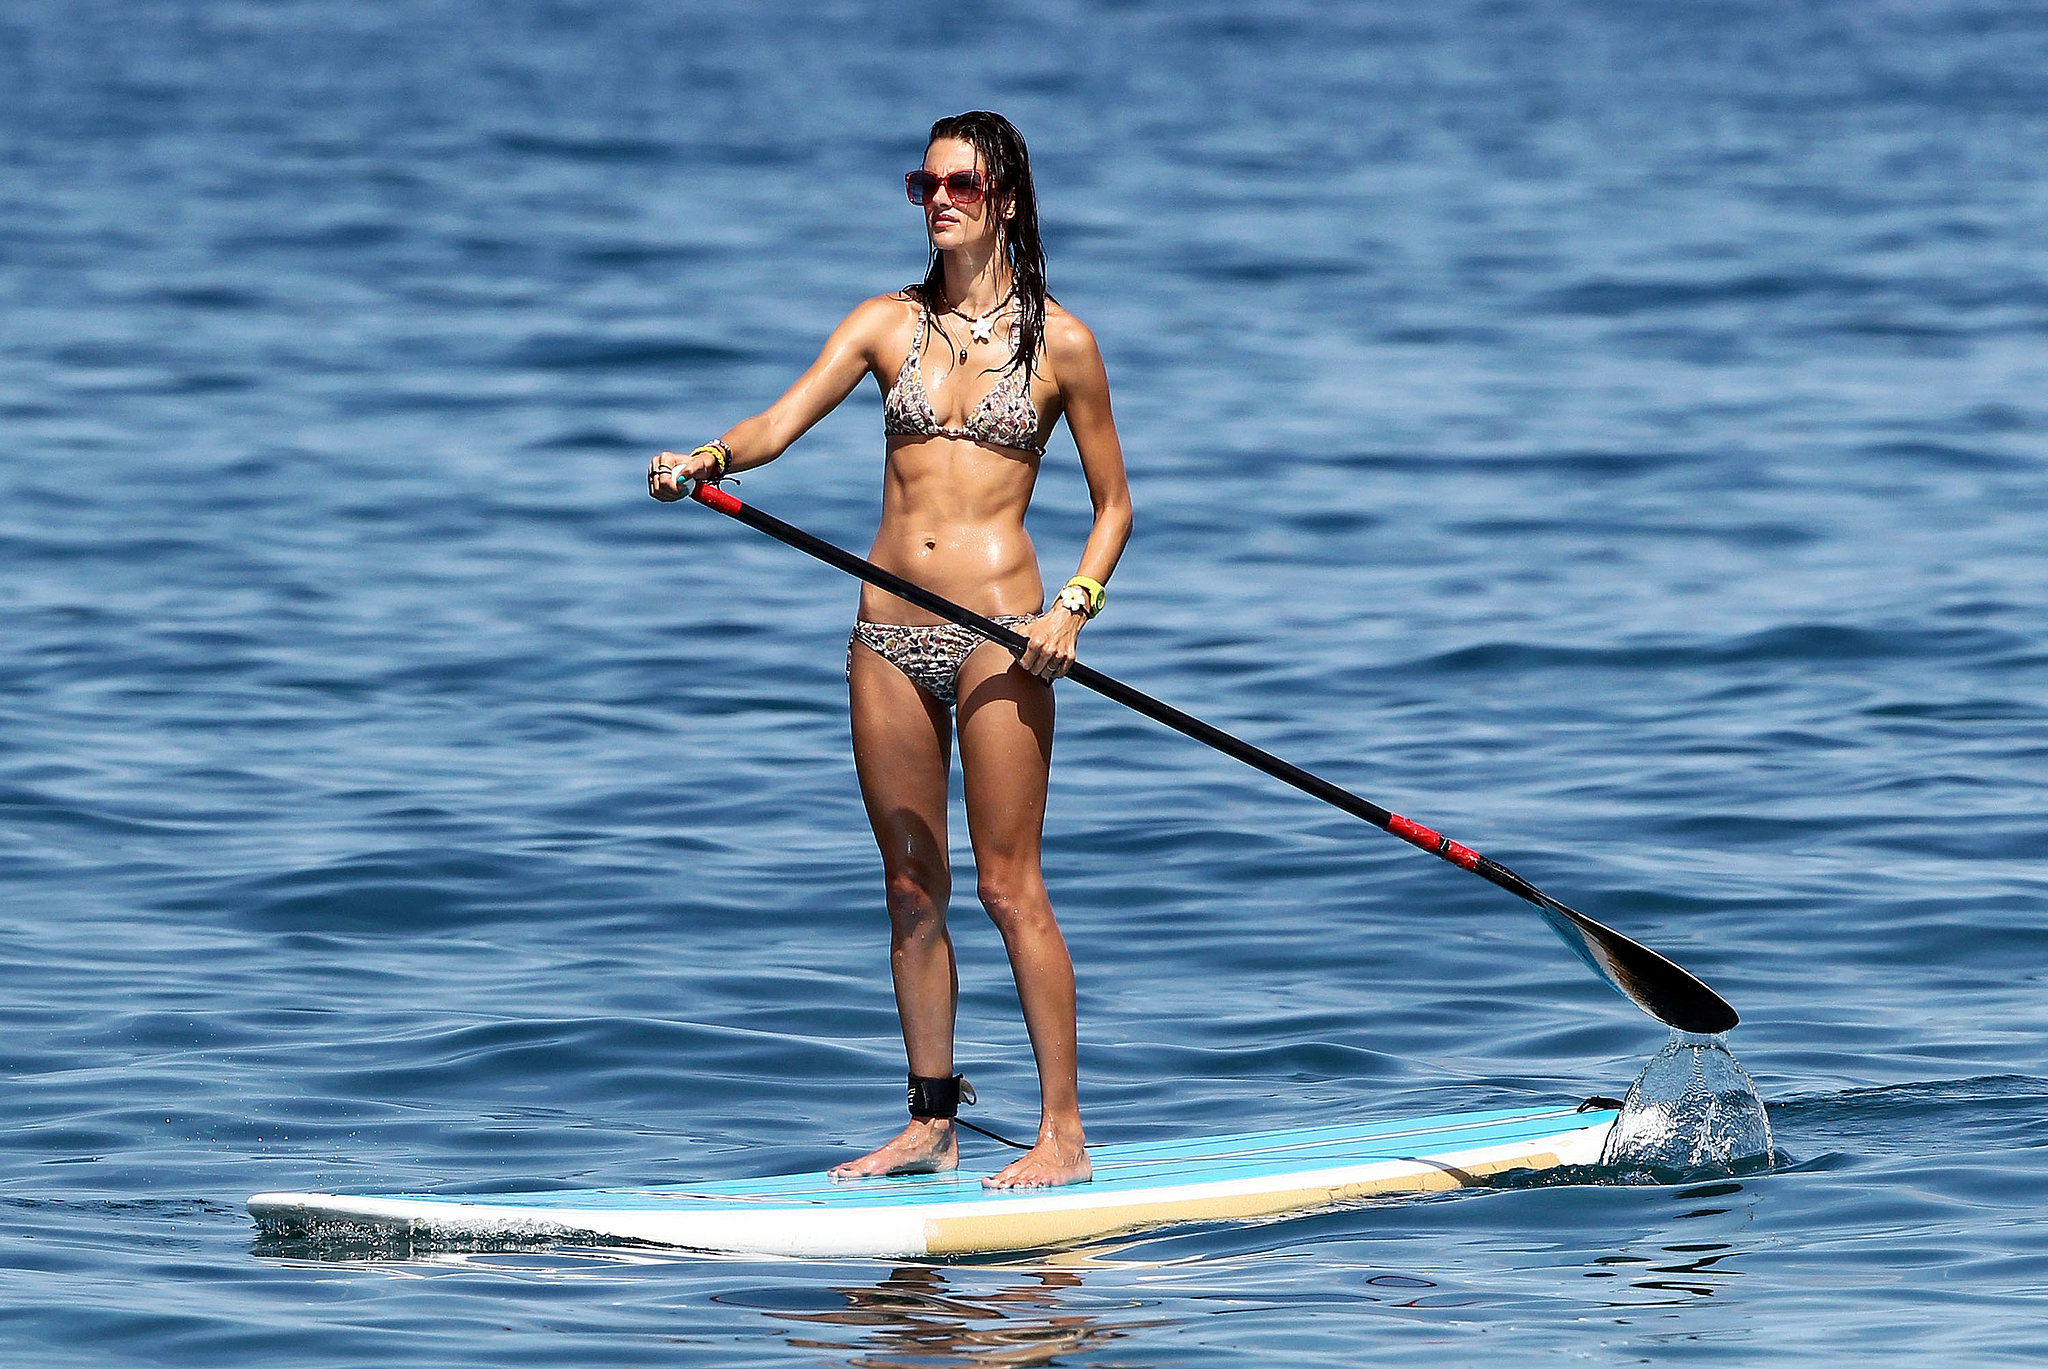 Alessandra-Ambrosio-paddle